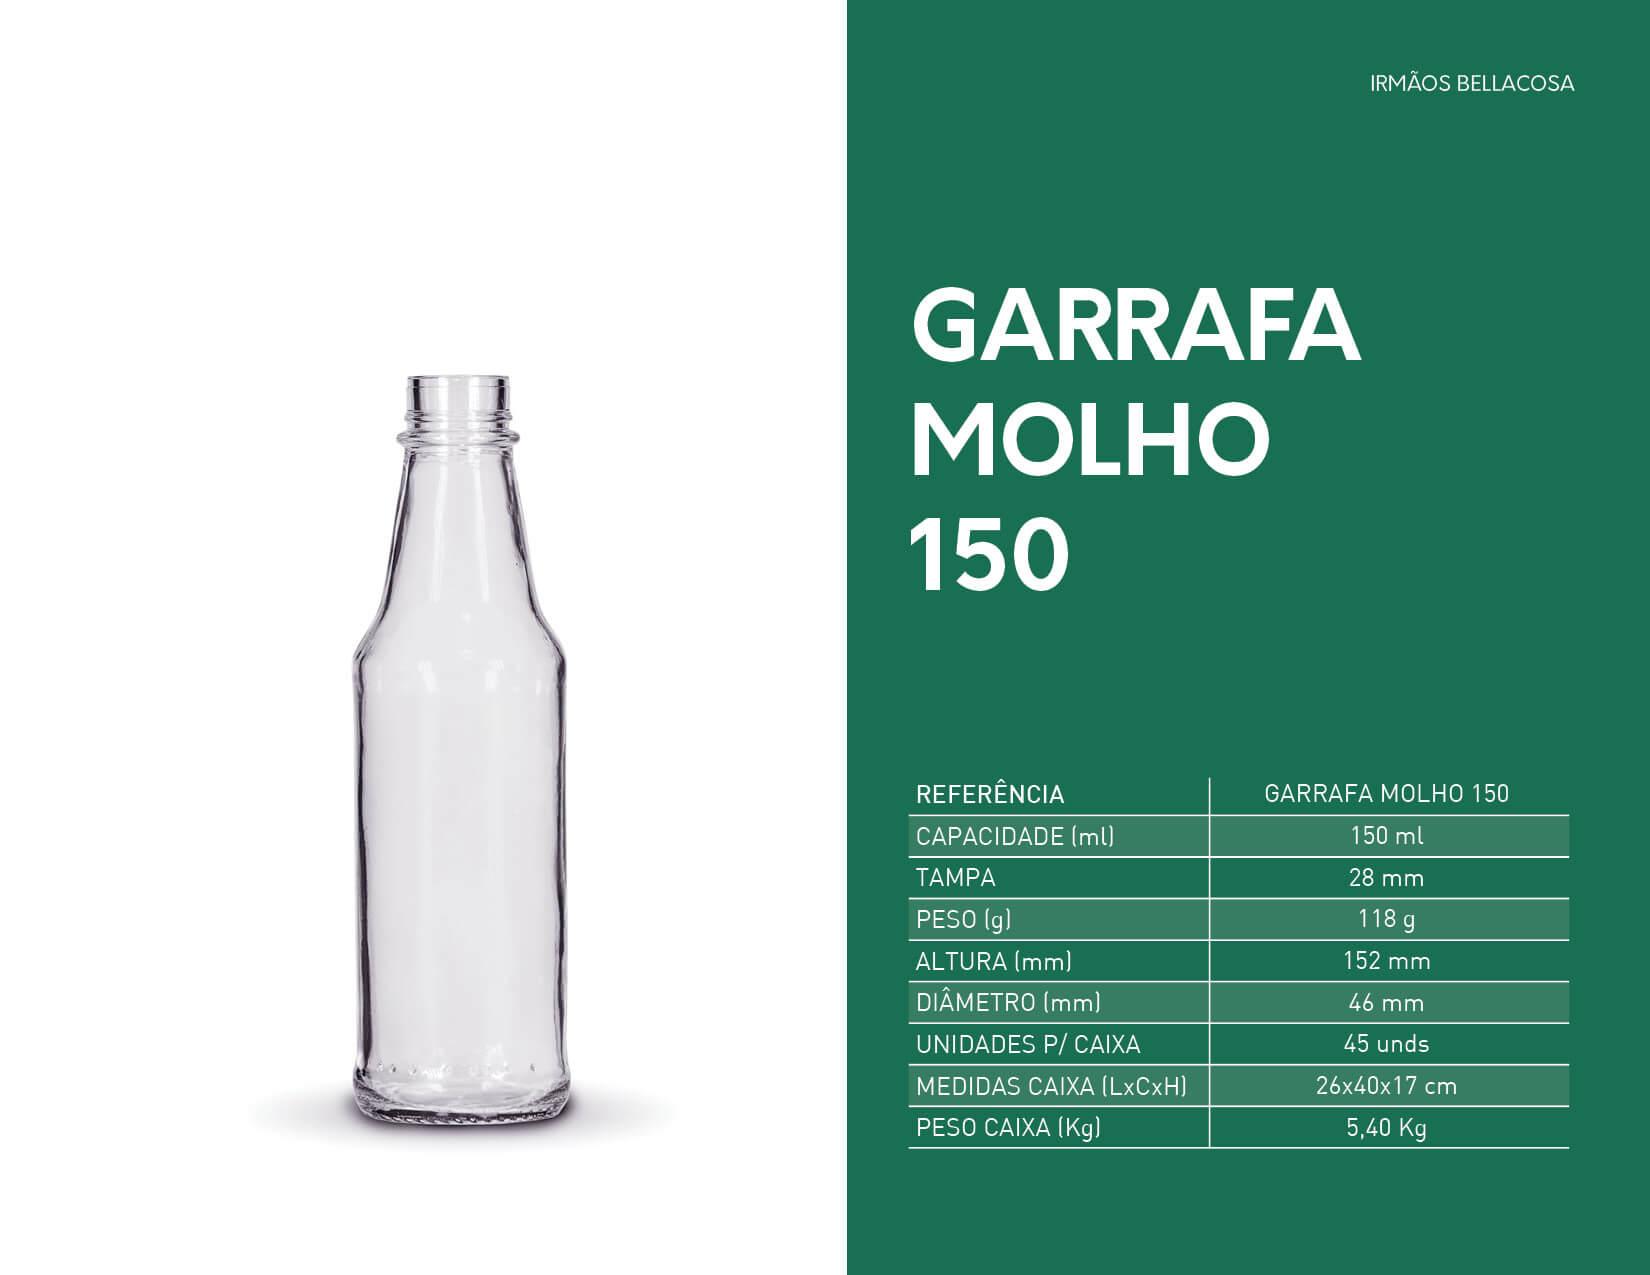 036-Garrafa-molho-150-irmaos-bellacosa-embalagens-de-vidro